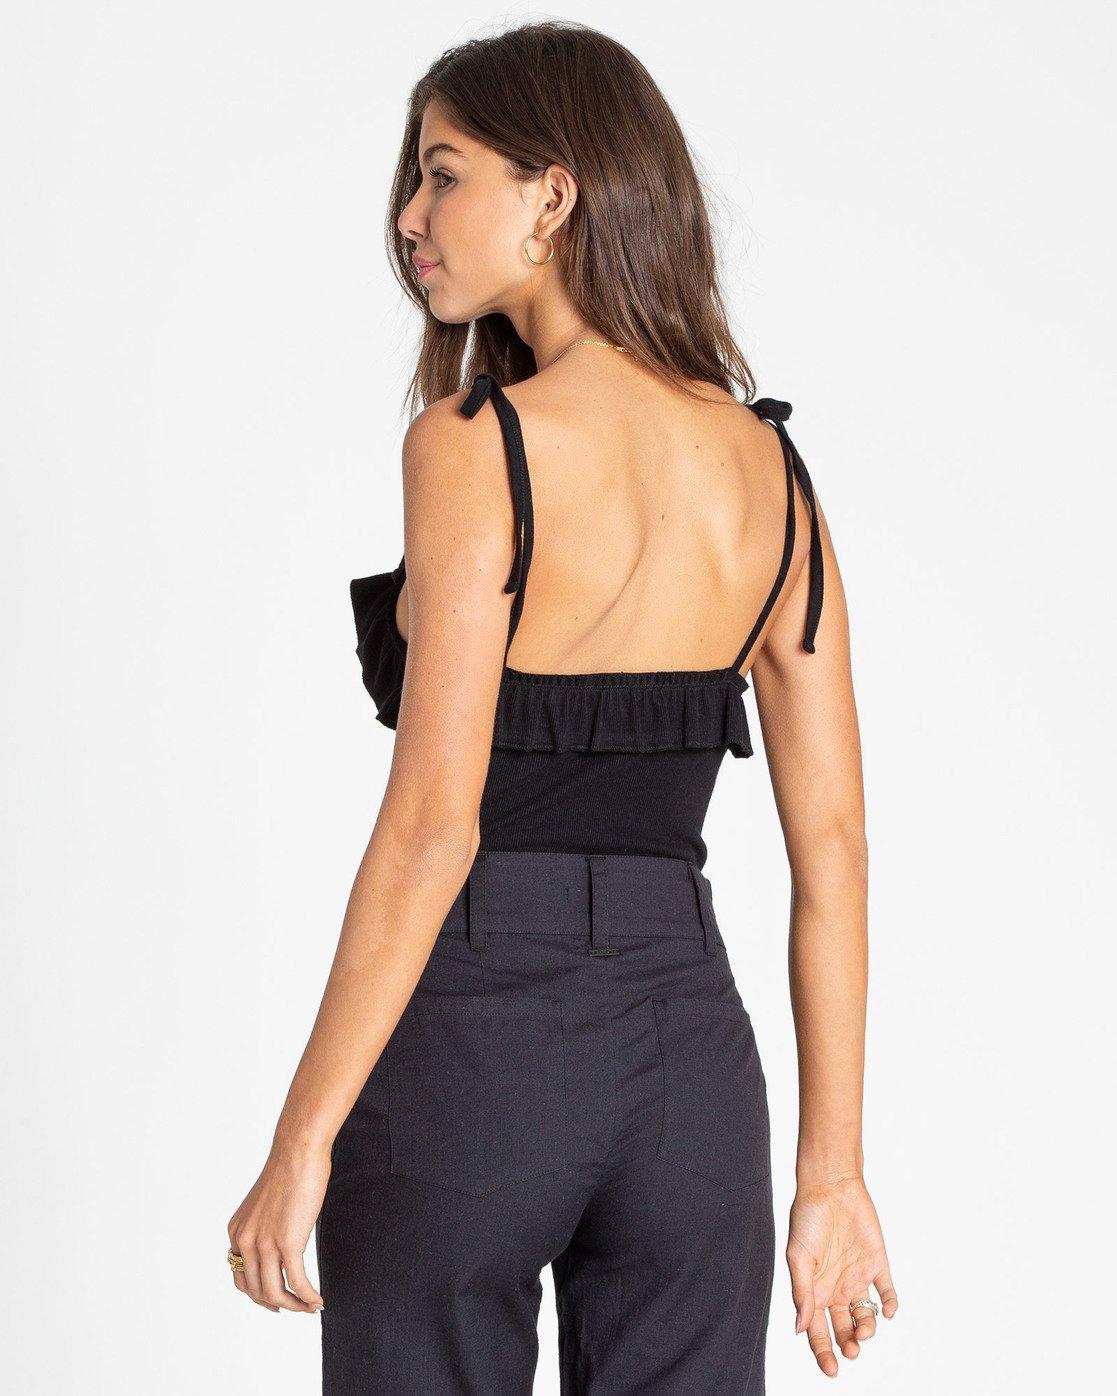 Billabong Womens Marbella Dream Bodysuit Black Small